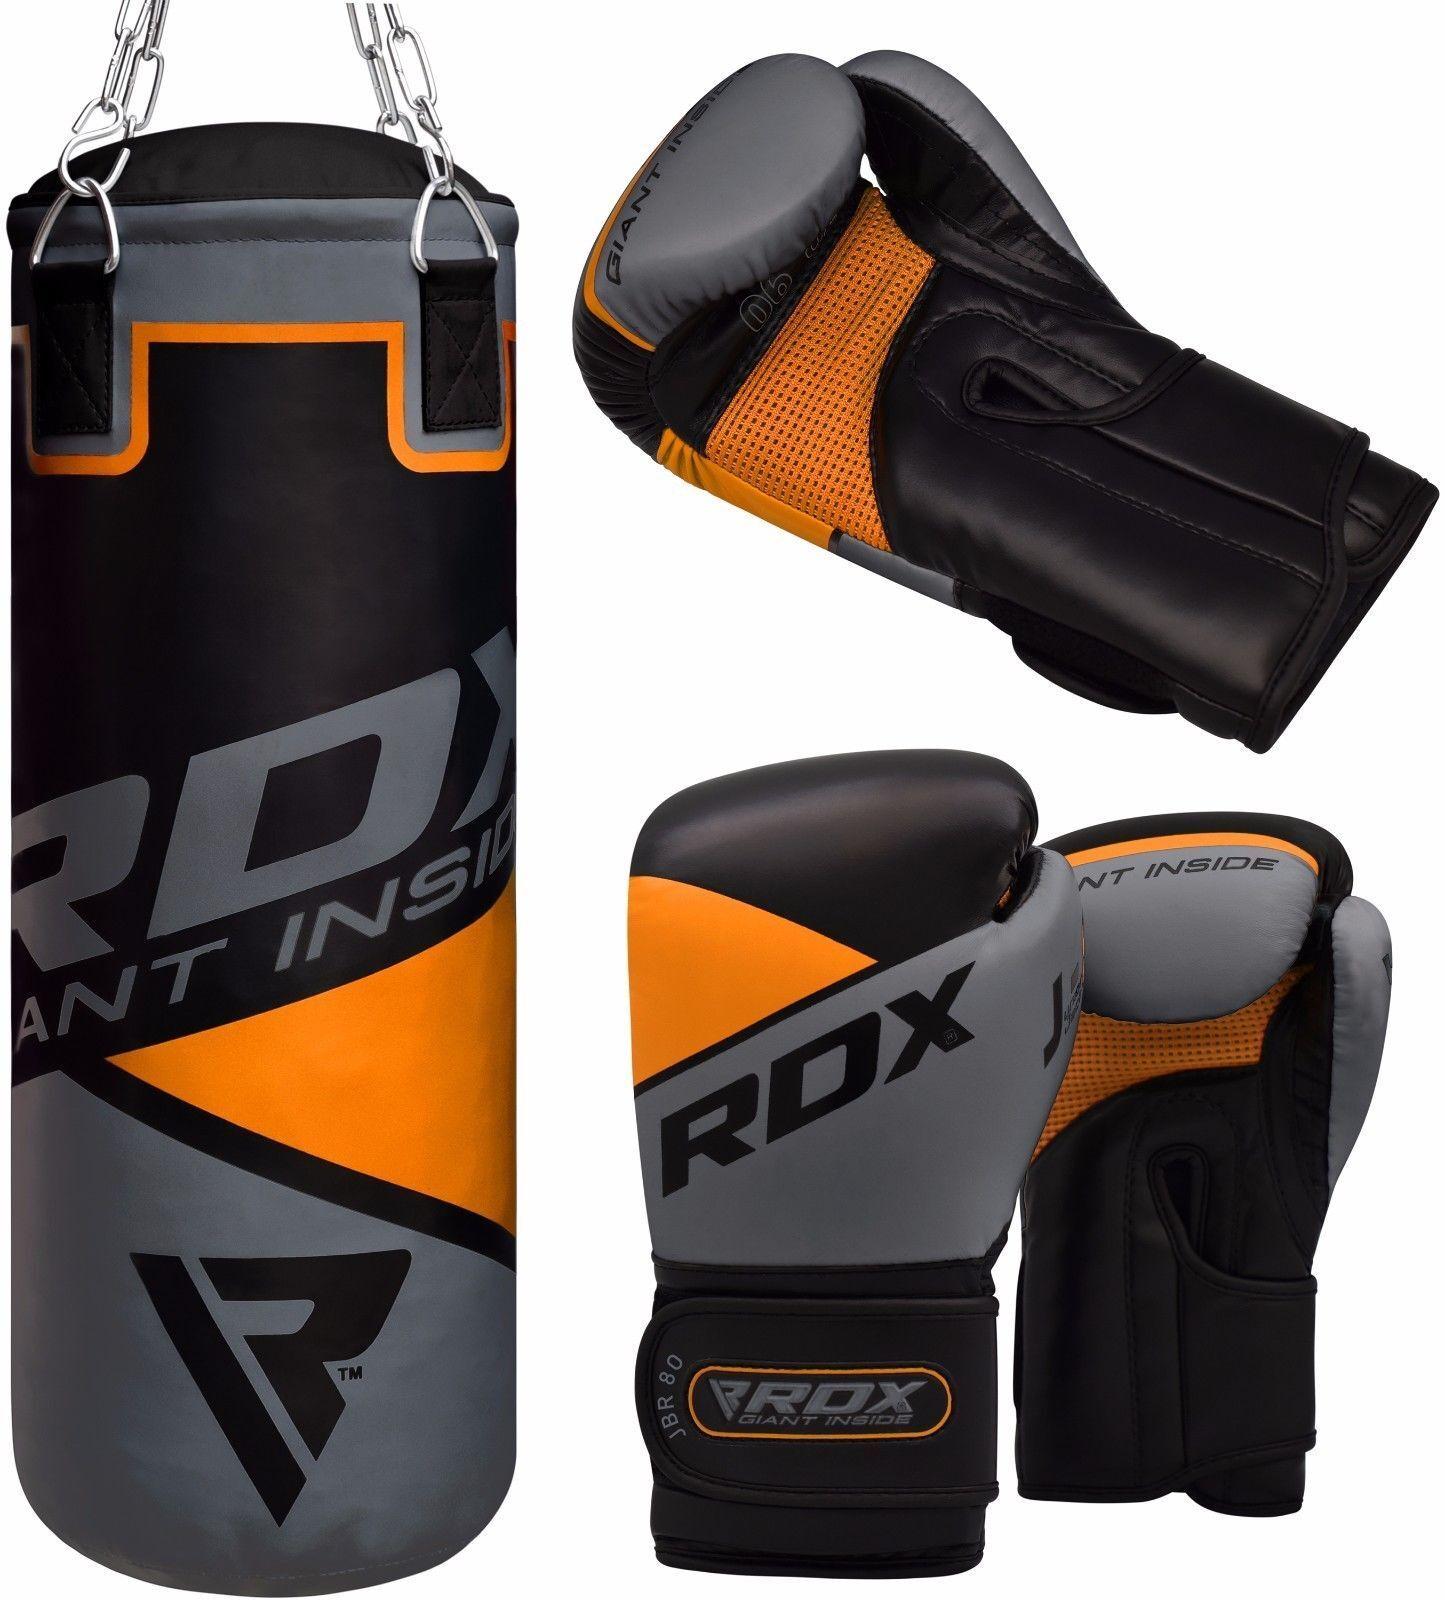 Child Youth Kids Boxing Kit Training Bag Set Punching Bag Gloves Heavy Bag